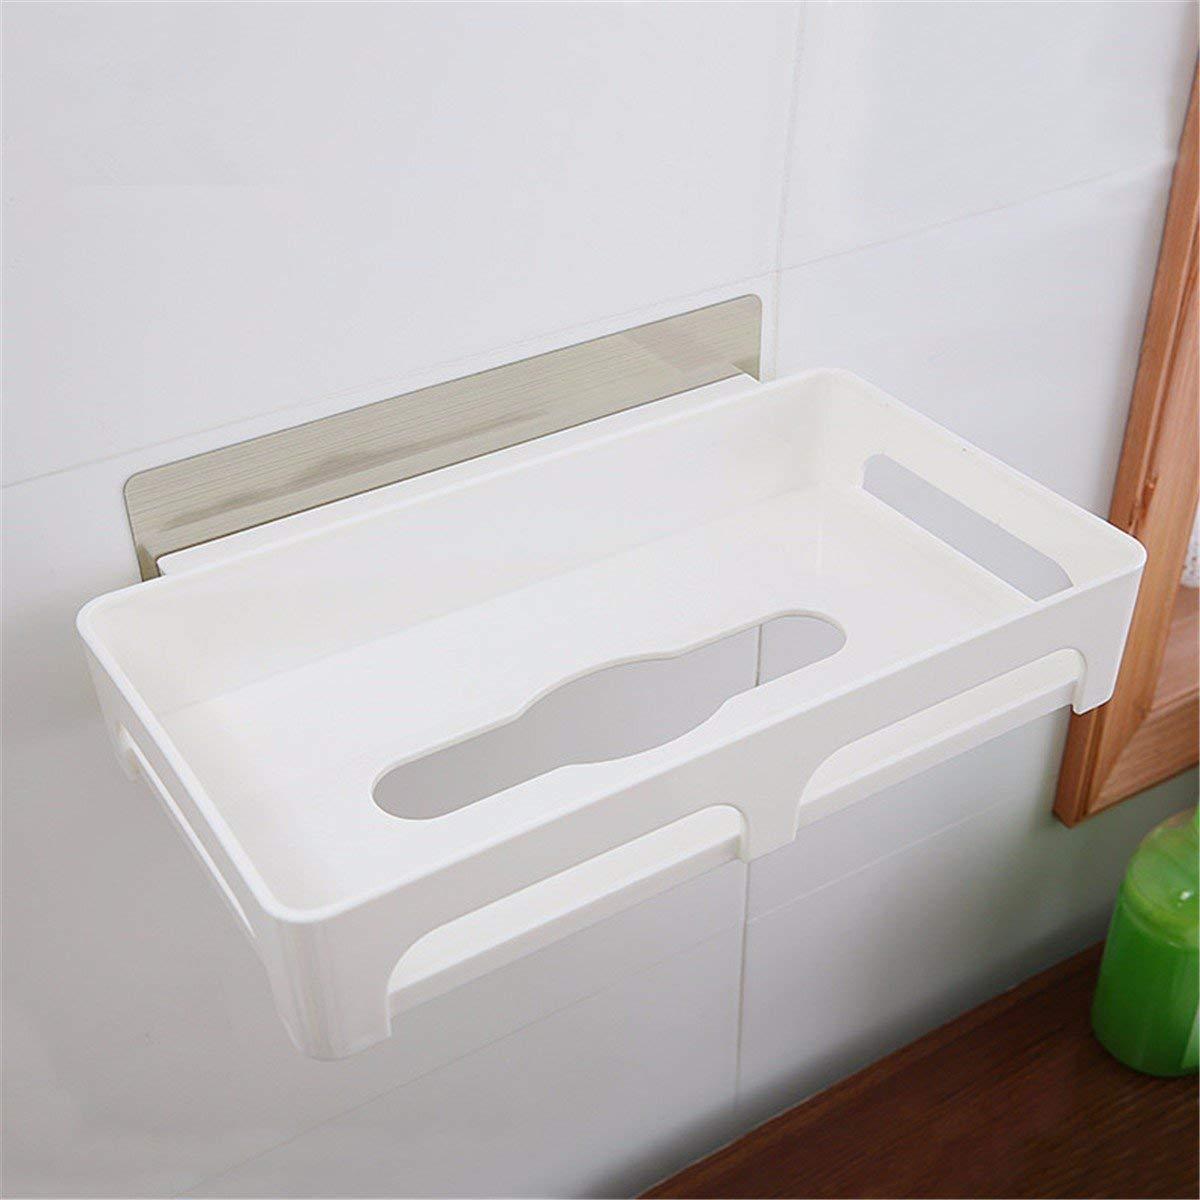 ZHAS Suction unit paper towel rack kitchen paper towel rack plastic paper towels in the cassette holder kitchen towel cartridge Toilet Paper Holders